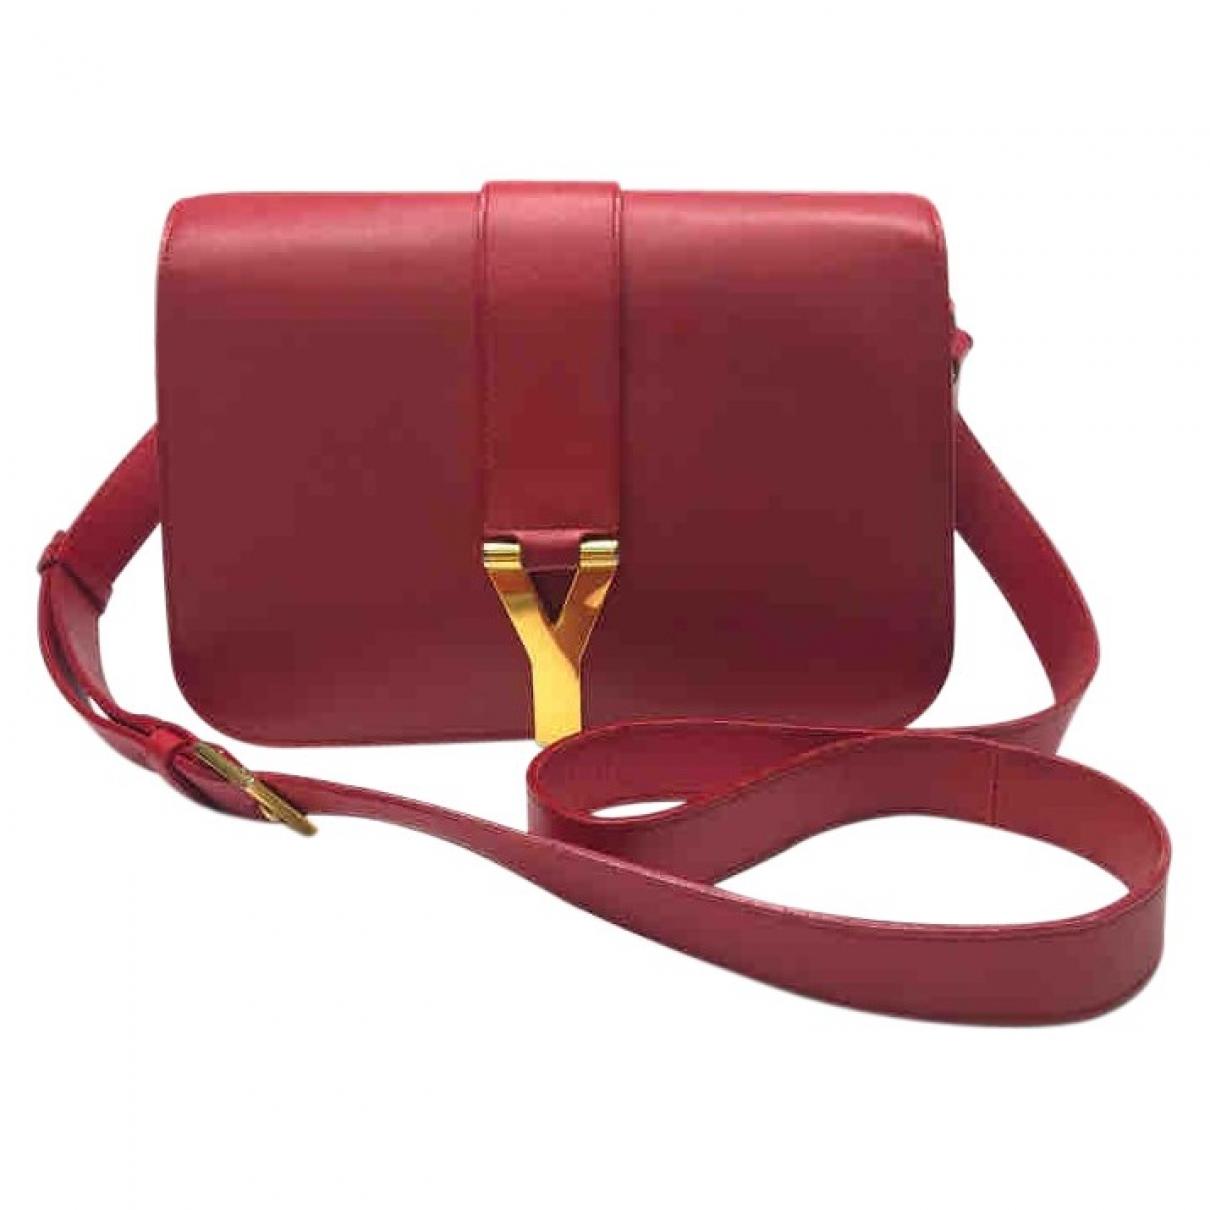 Saint Laurent Chyc Handtasche in  Rosa Leder